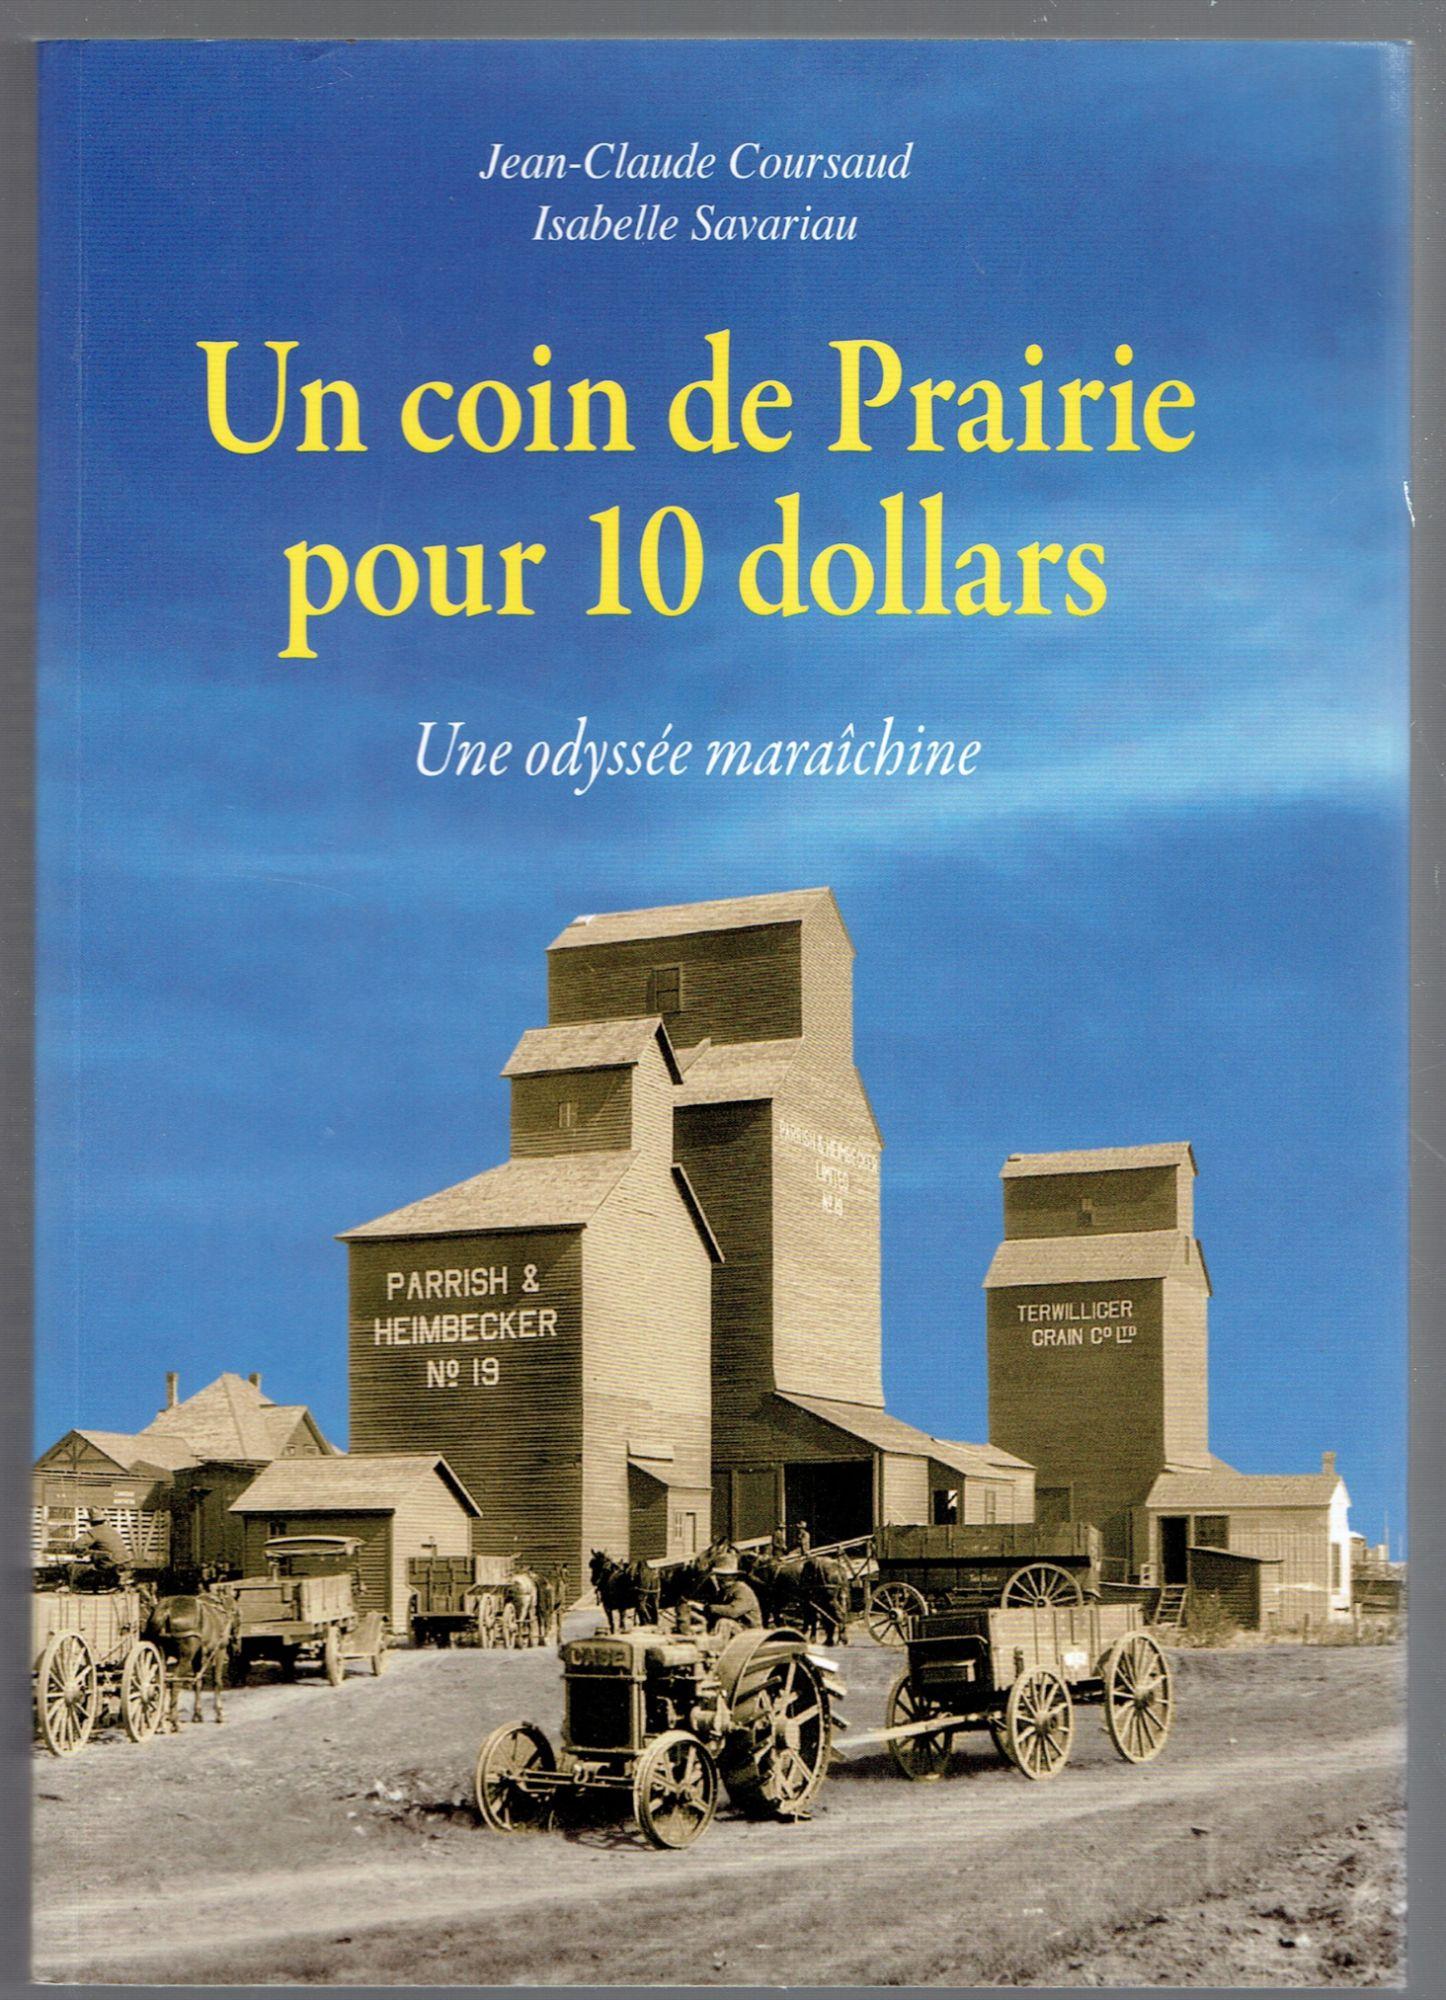 Un coin de prairie pour 10 dollars Jean-Claude Coursaud.jpg